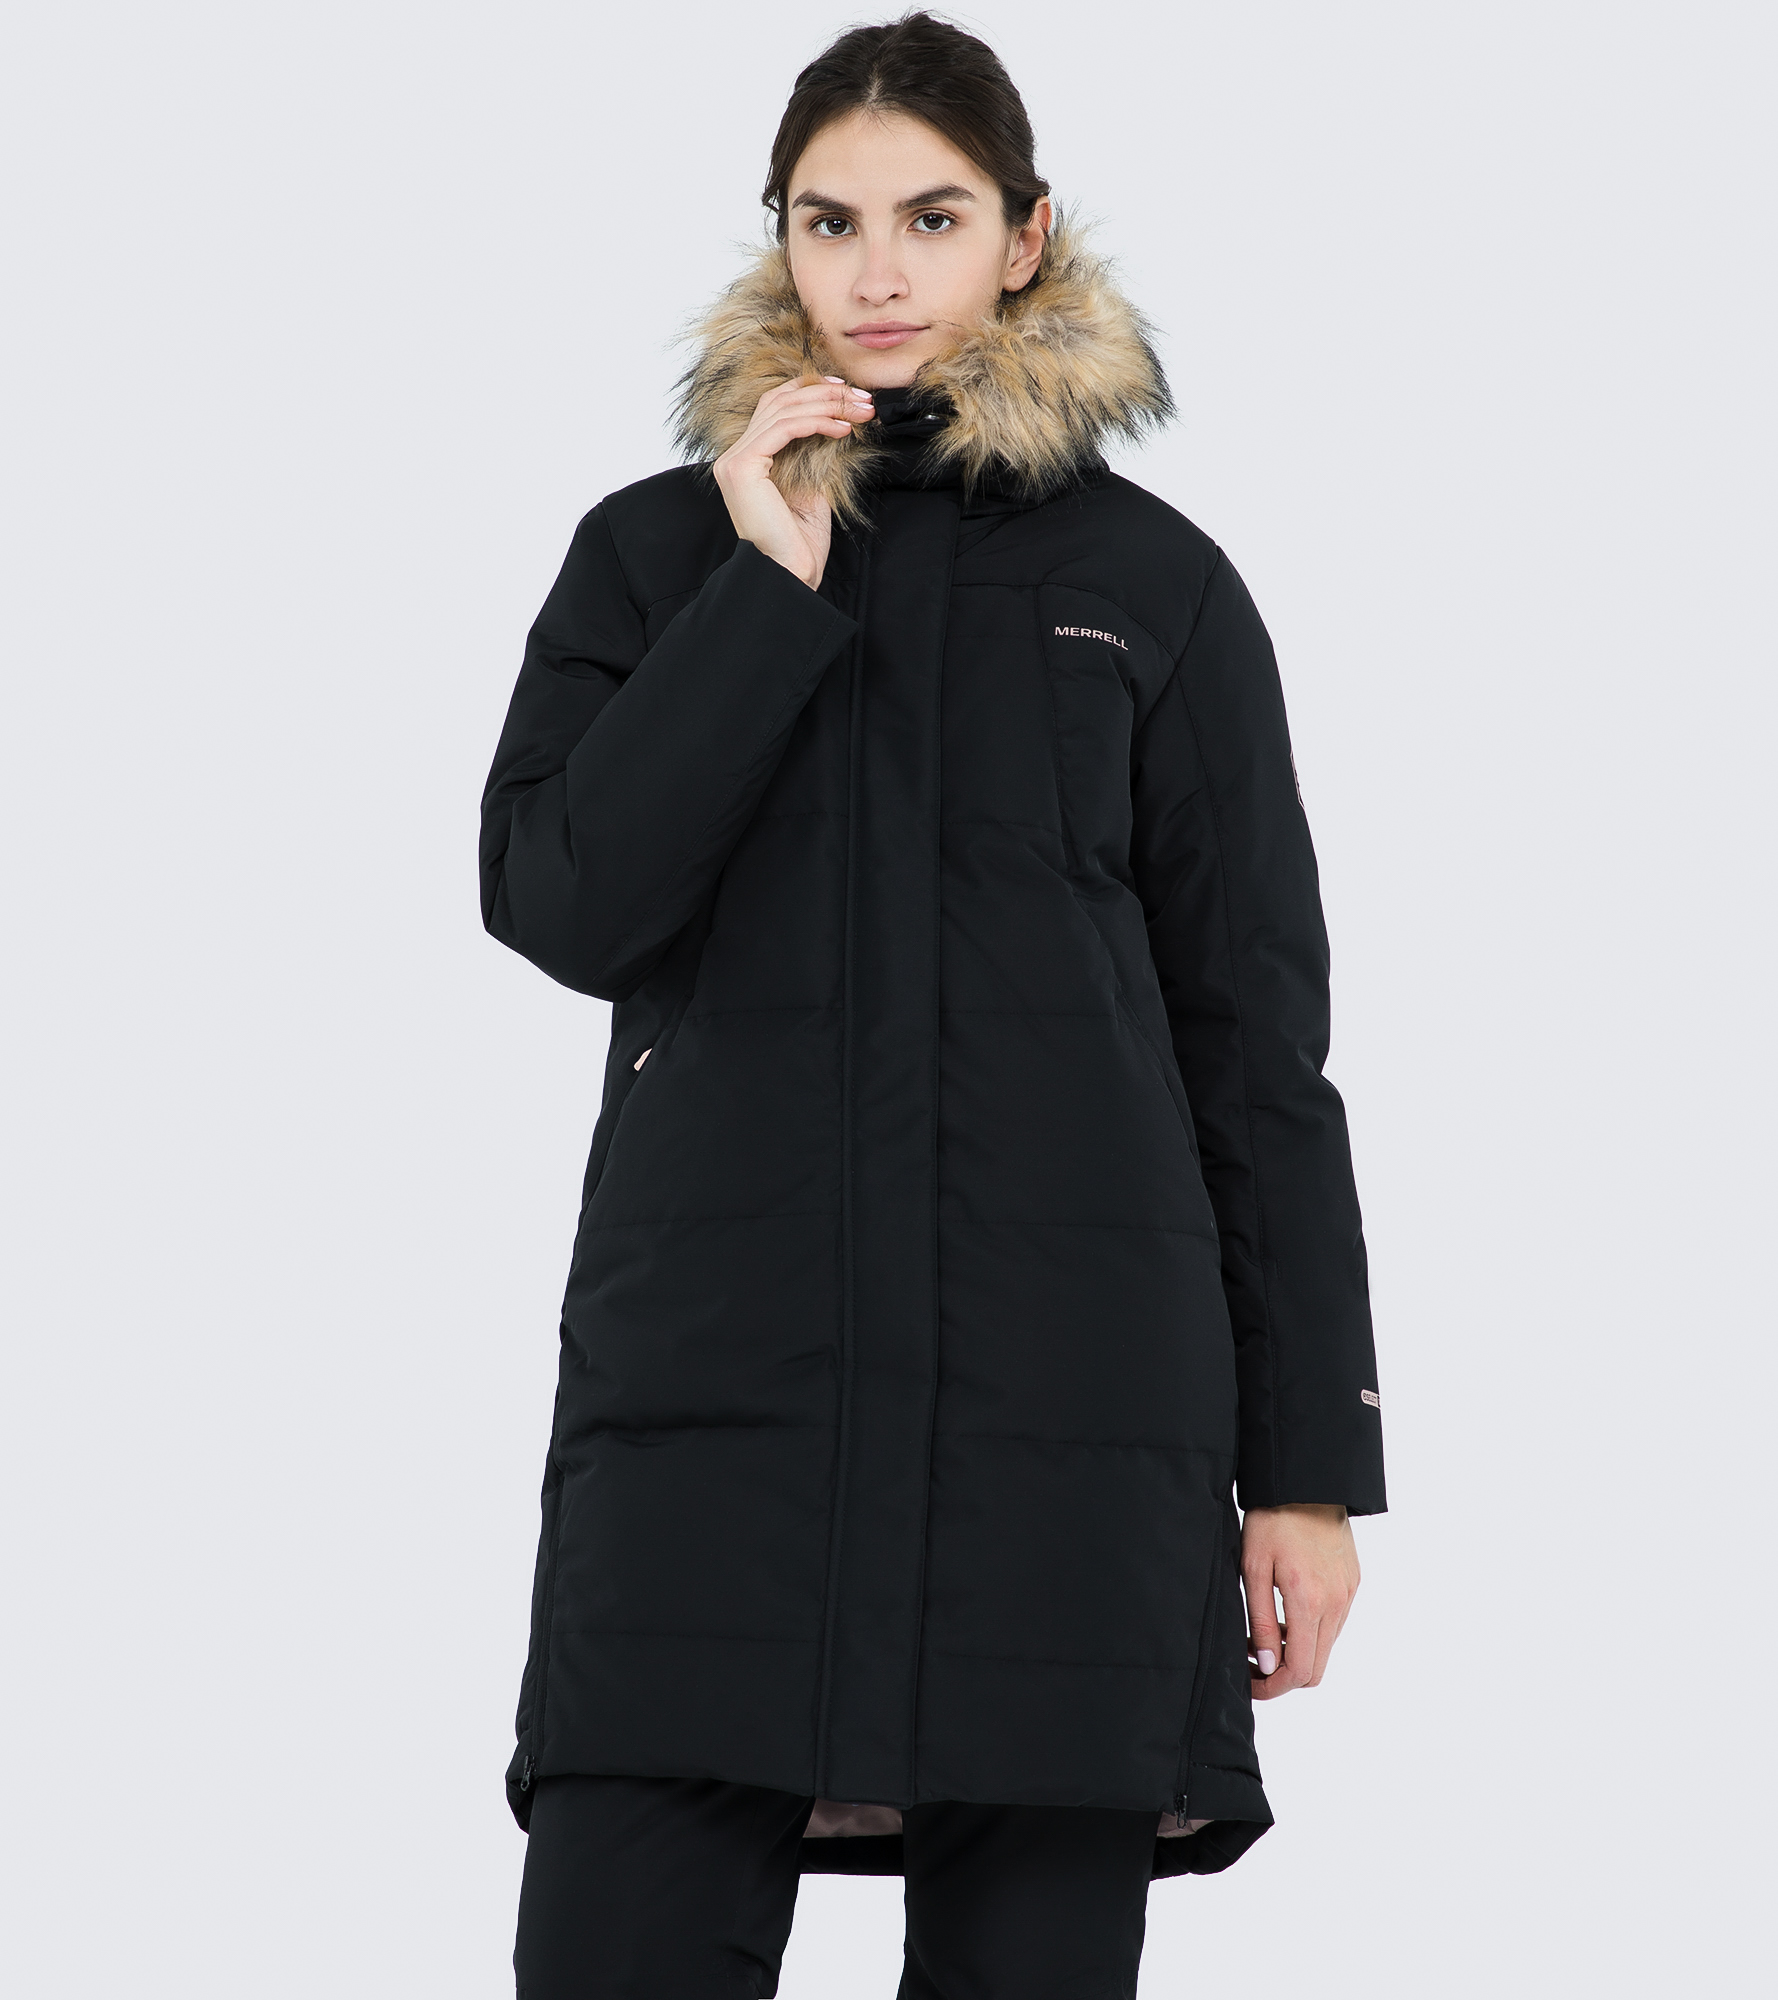 Merrell Куртка пуховая женская Merrell, размер 46 пуховик женский merrell women s jacket цвет петроль a19amrjaw02 s3 размер 46